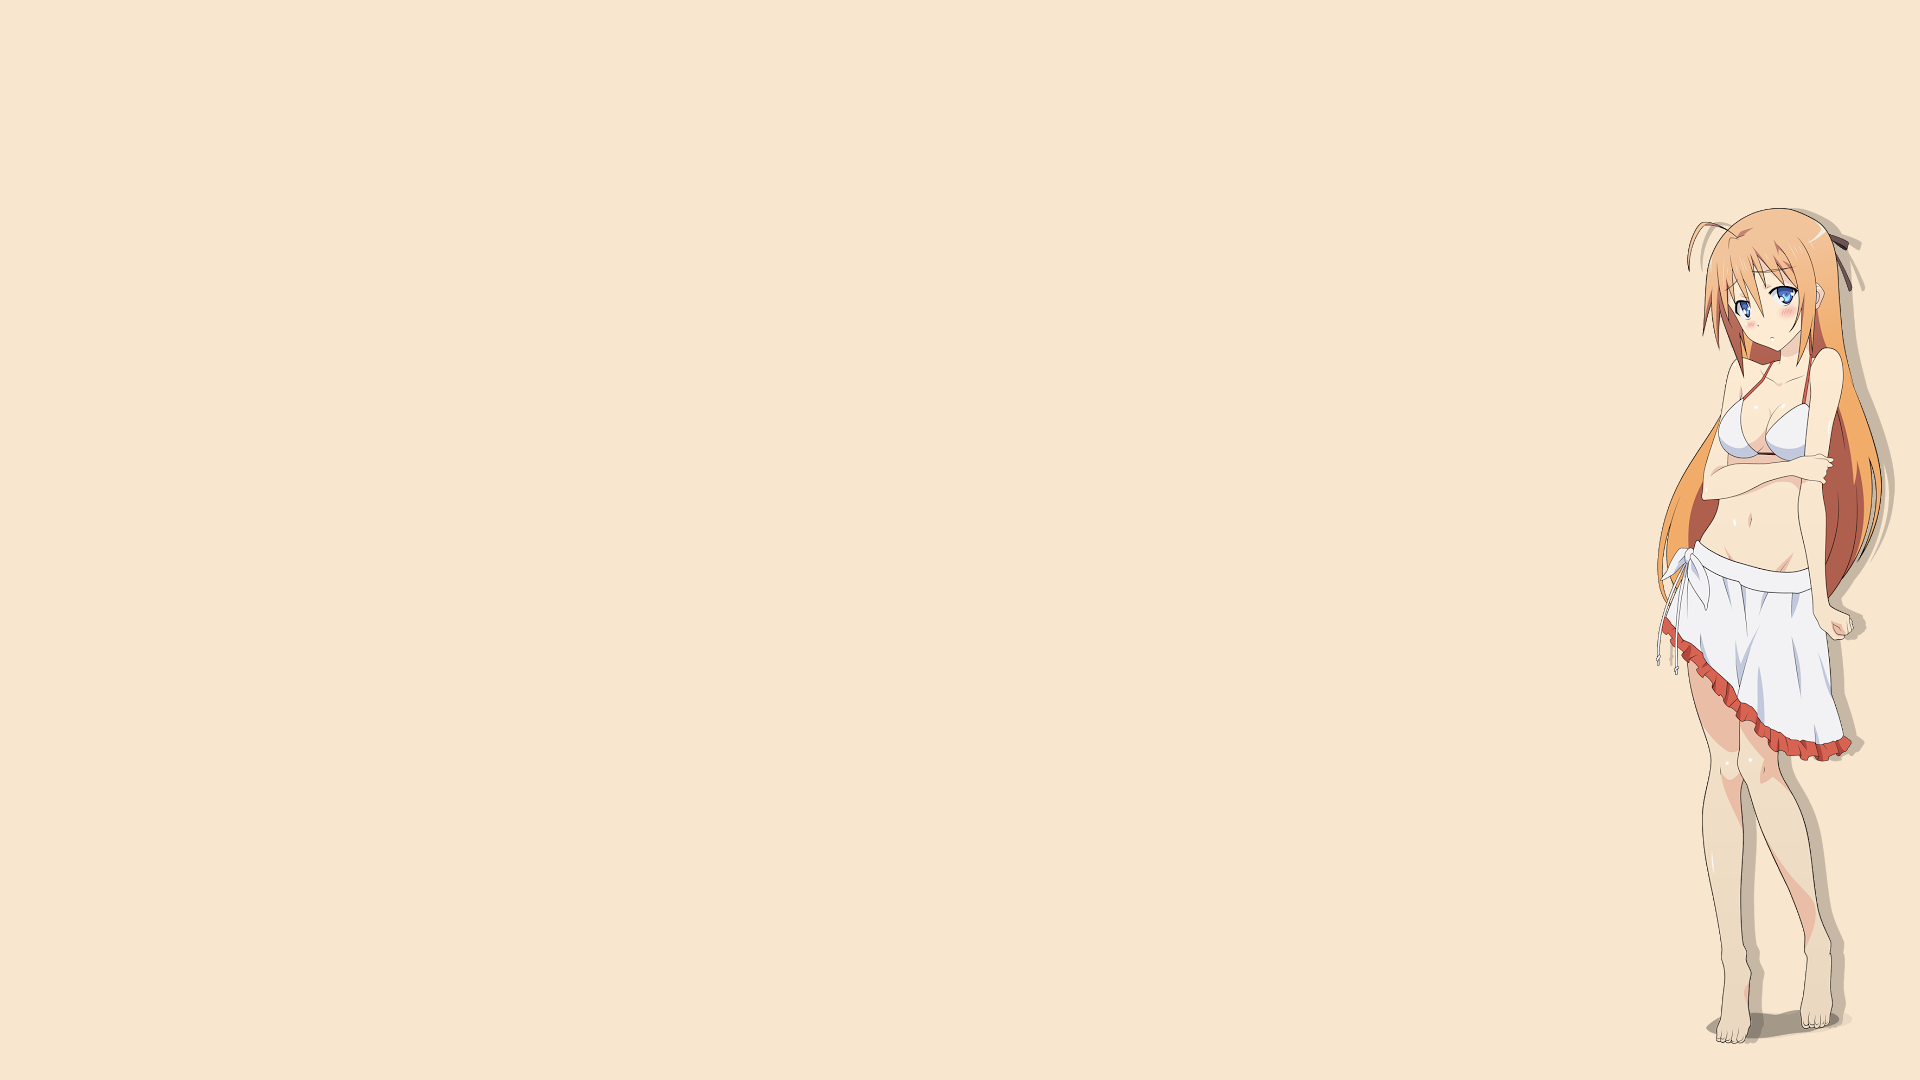 Anime Vectors Iphone Wallpaper